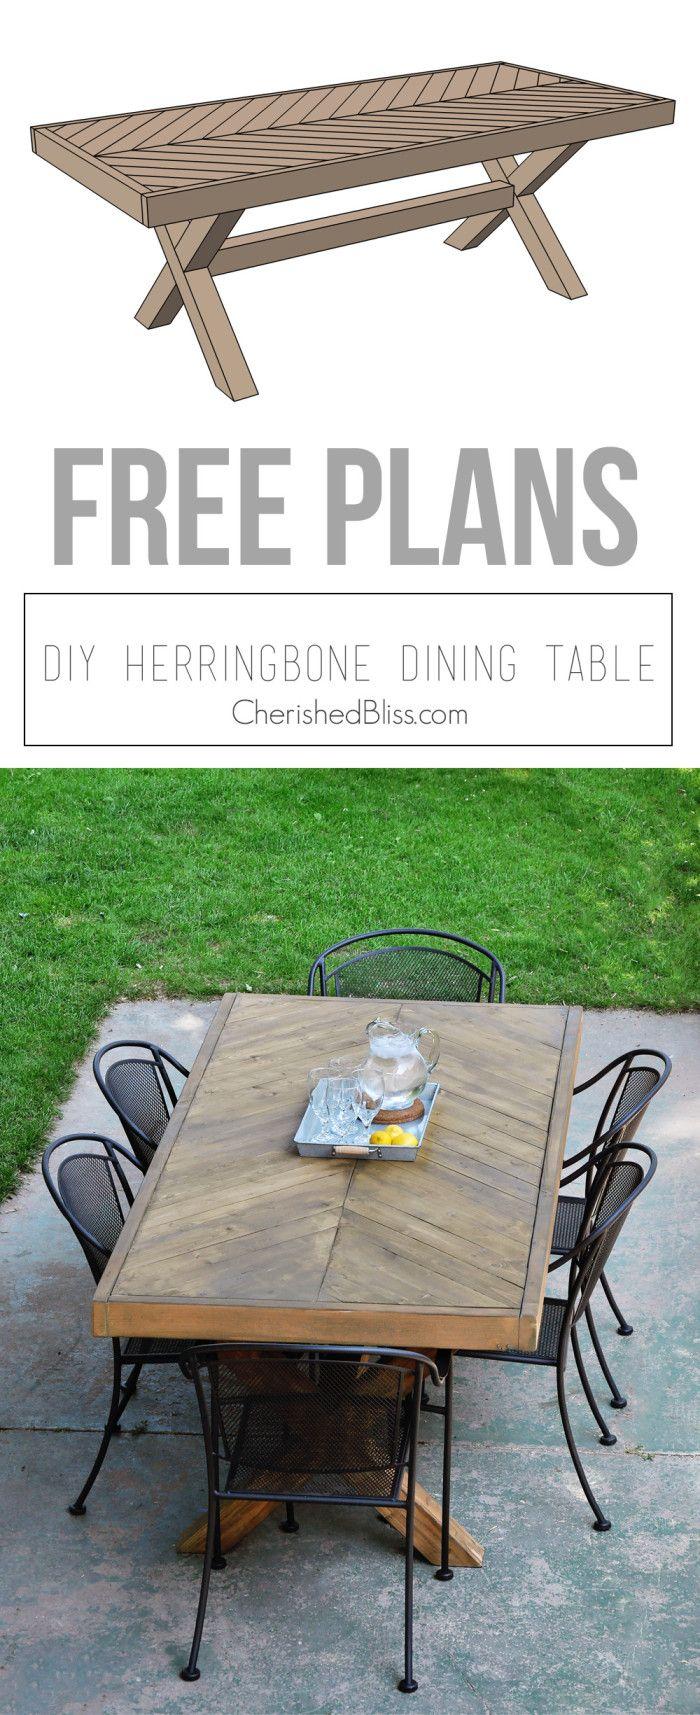 salle manger diy outdoor table free plans cherished bliss leading. Black Bedroom Furniture Sets. Home Design Ideas